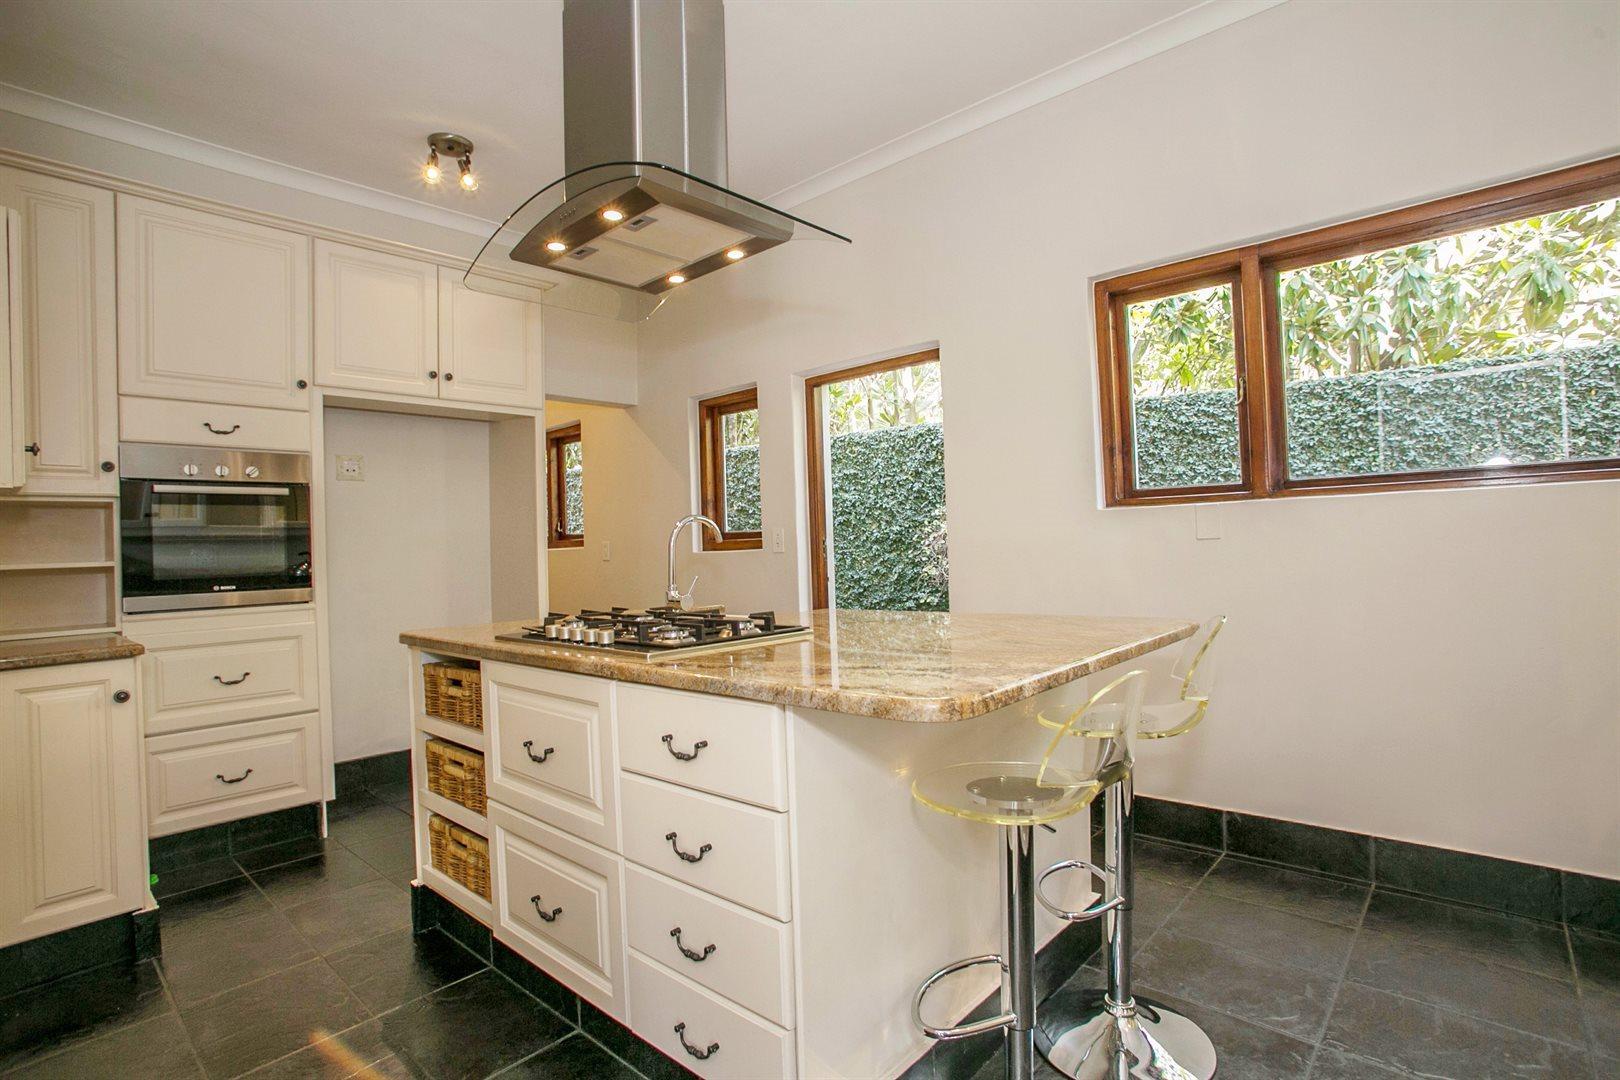 Dainfern Golf Estate property for sale. Ref No: 13381182. Picture no 3